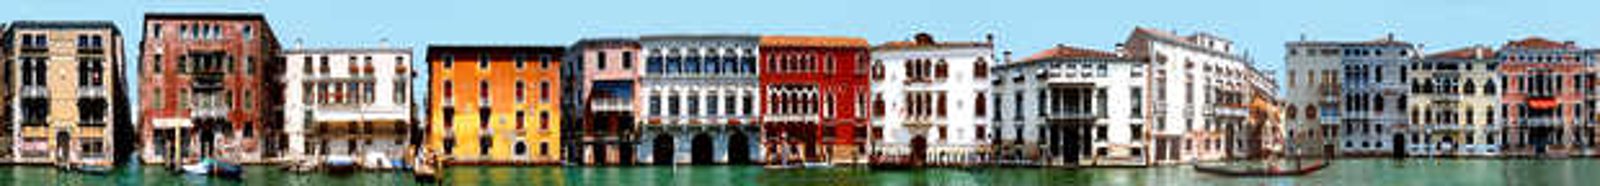 Grand Canal, Cannareggio, Venice, Italy - Larry Yust